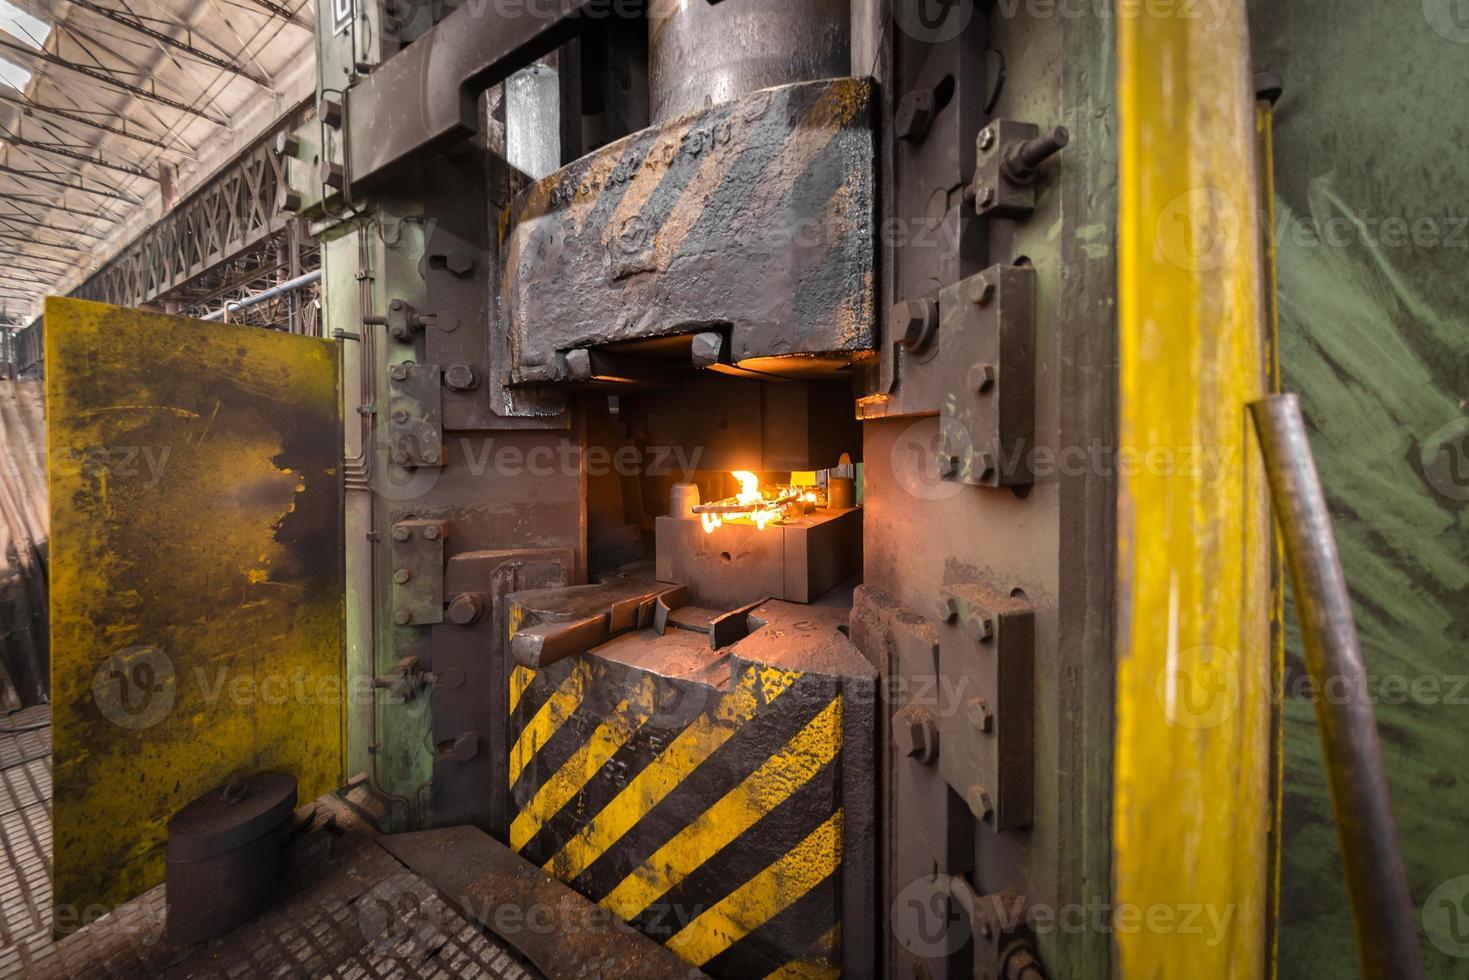 ferro caldo in fonderia foto